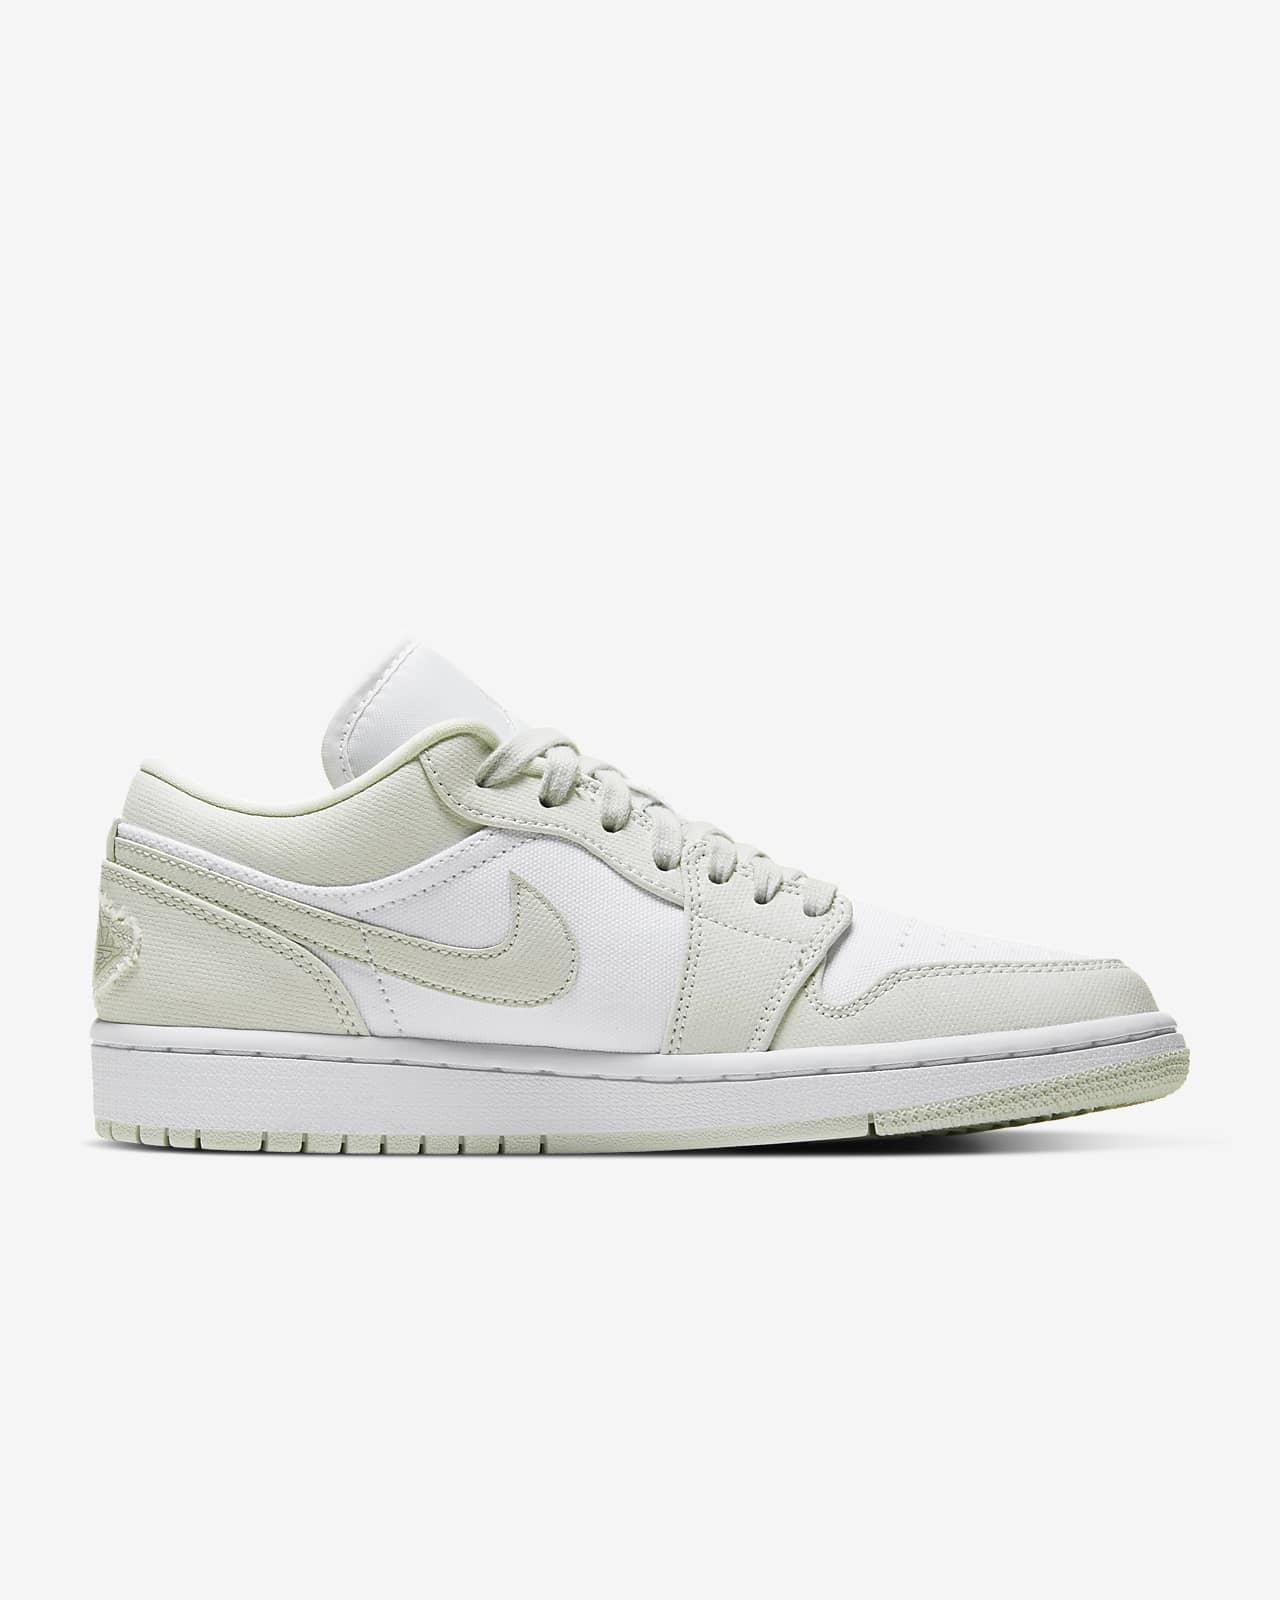 Saqueo conductor domingo  Air Jordan 1 Low Women's Shoe. Nike ID